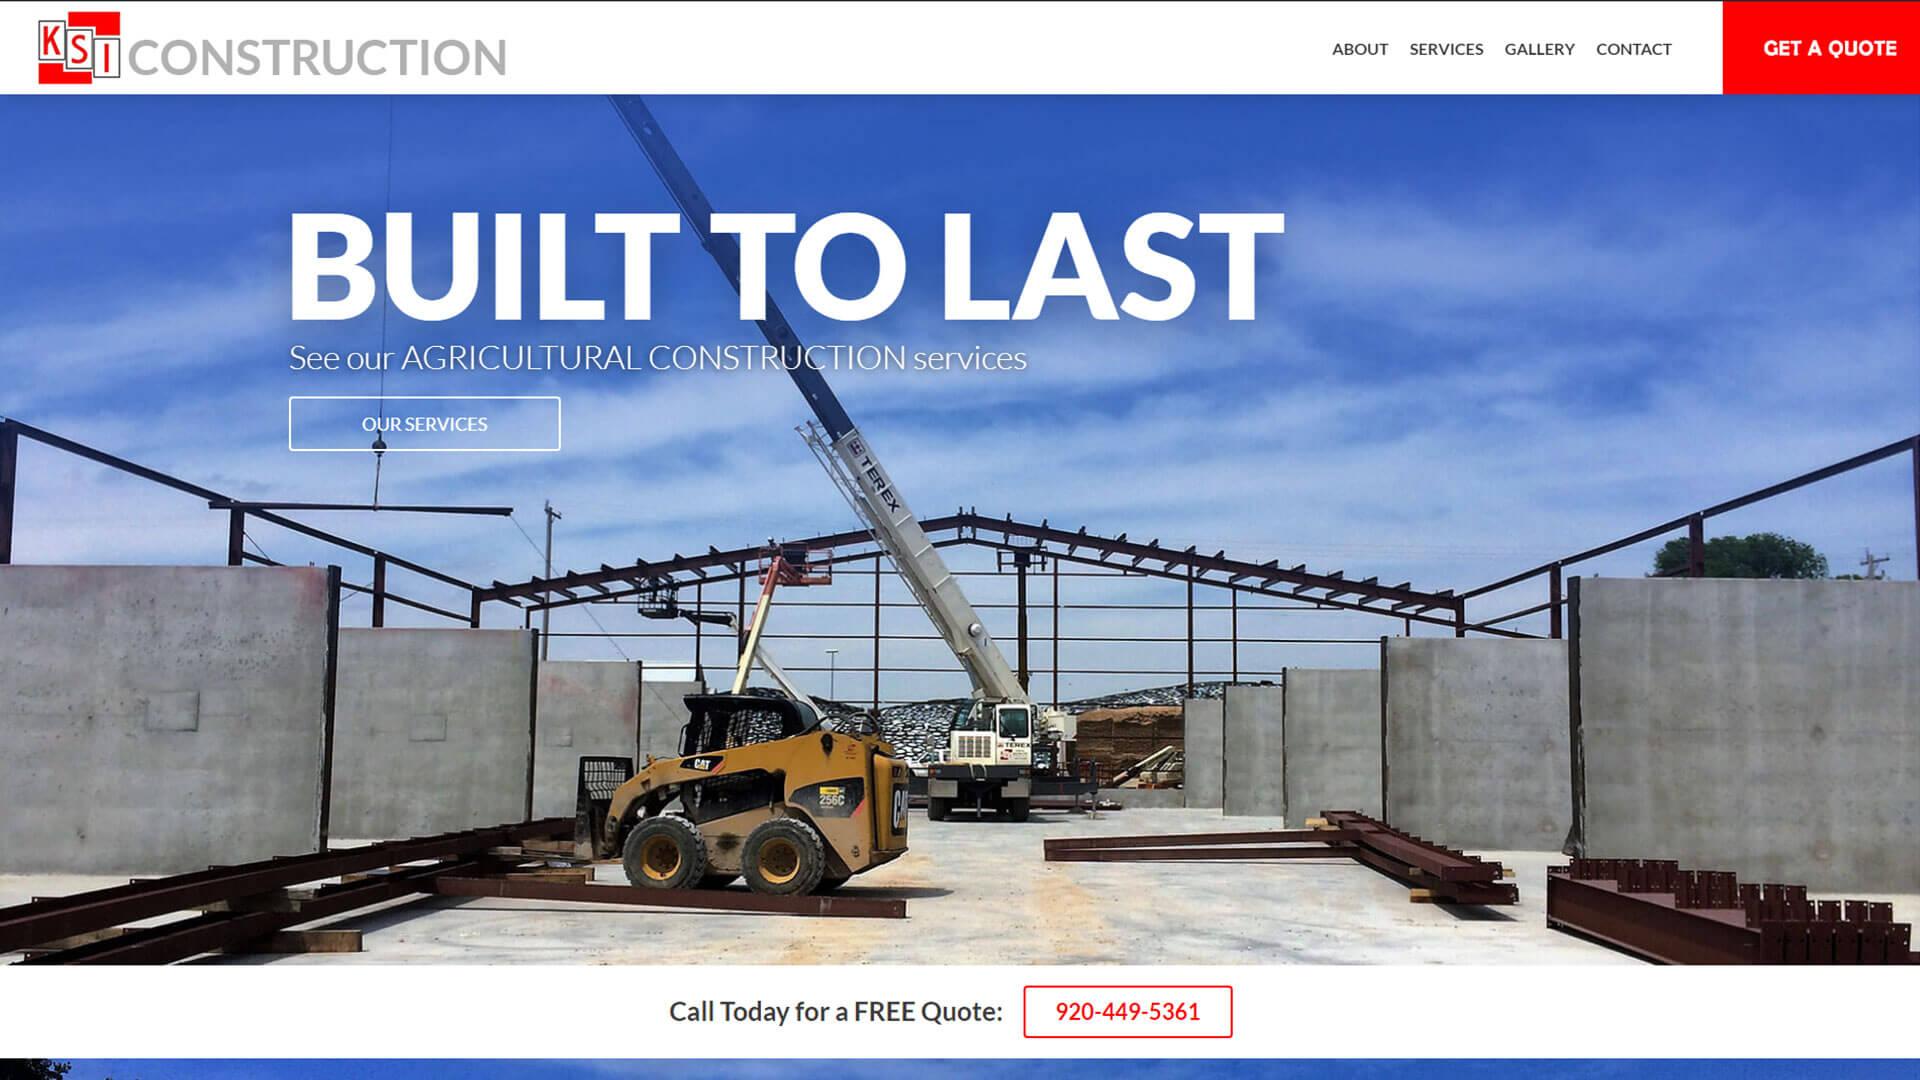 ksi-construction-large.51b6406a